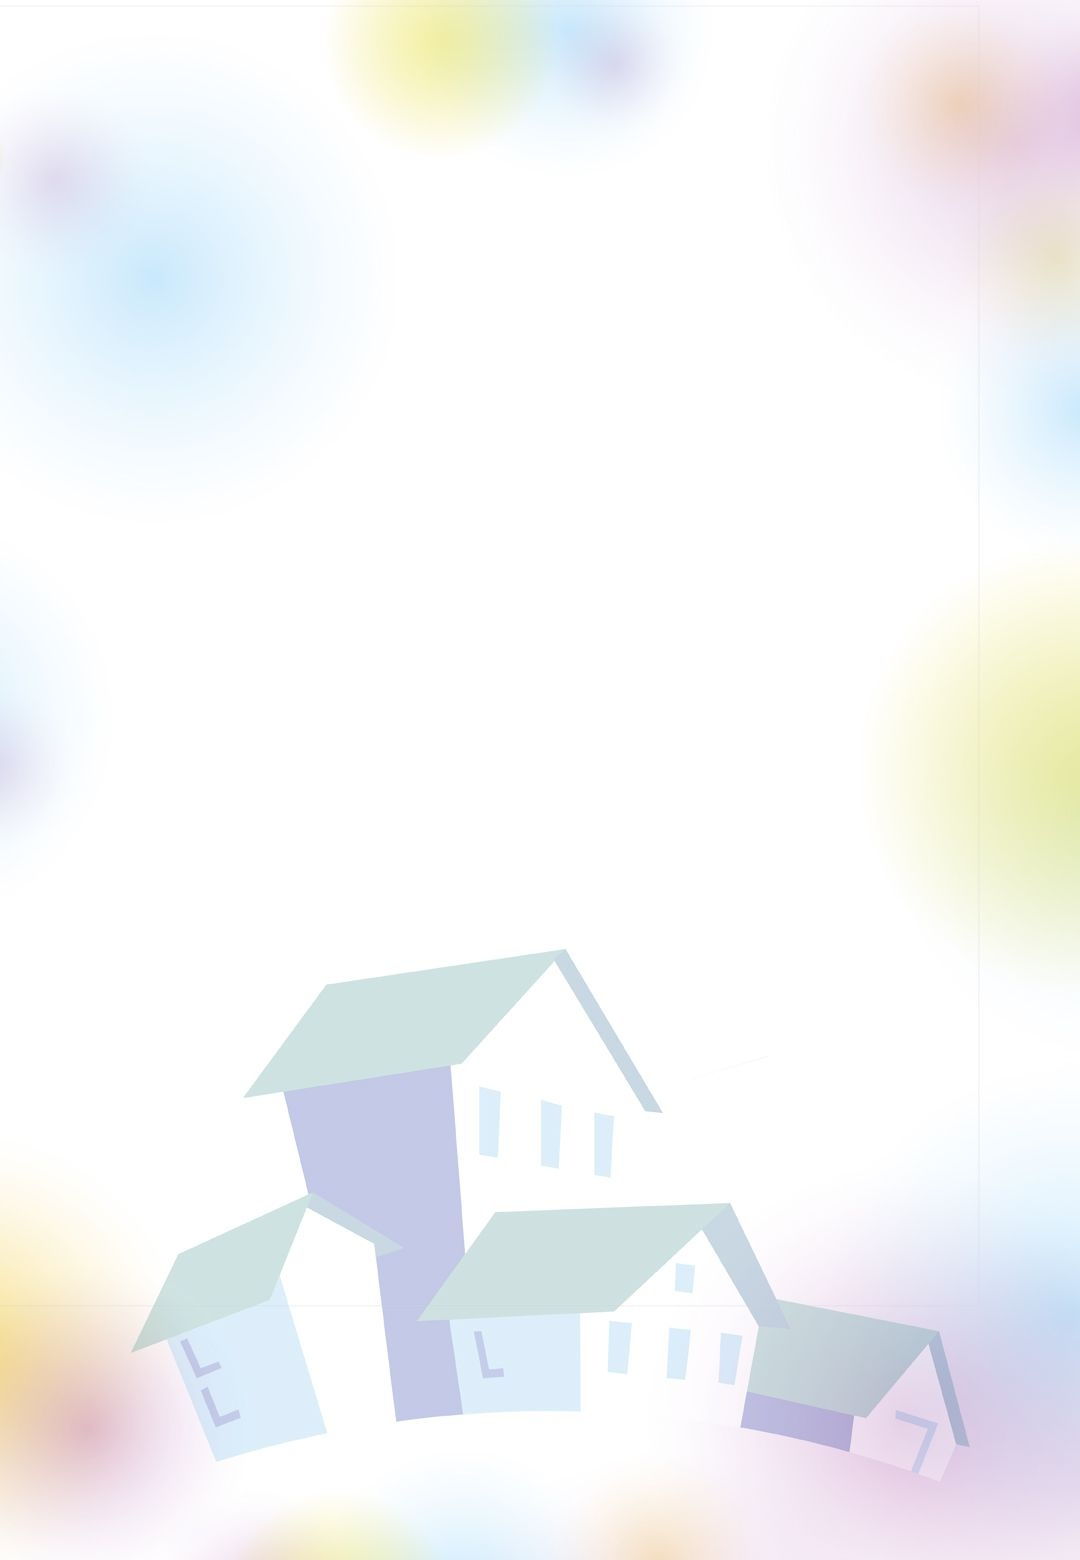 Housewarming Invitation Free Printable   Parties   Holidays - Free Printable Housewarming Invitations Cards